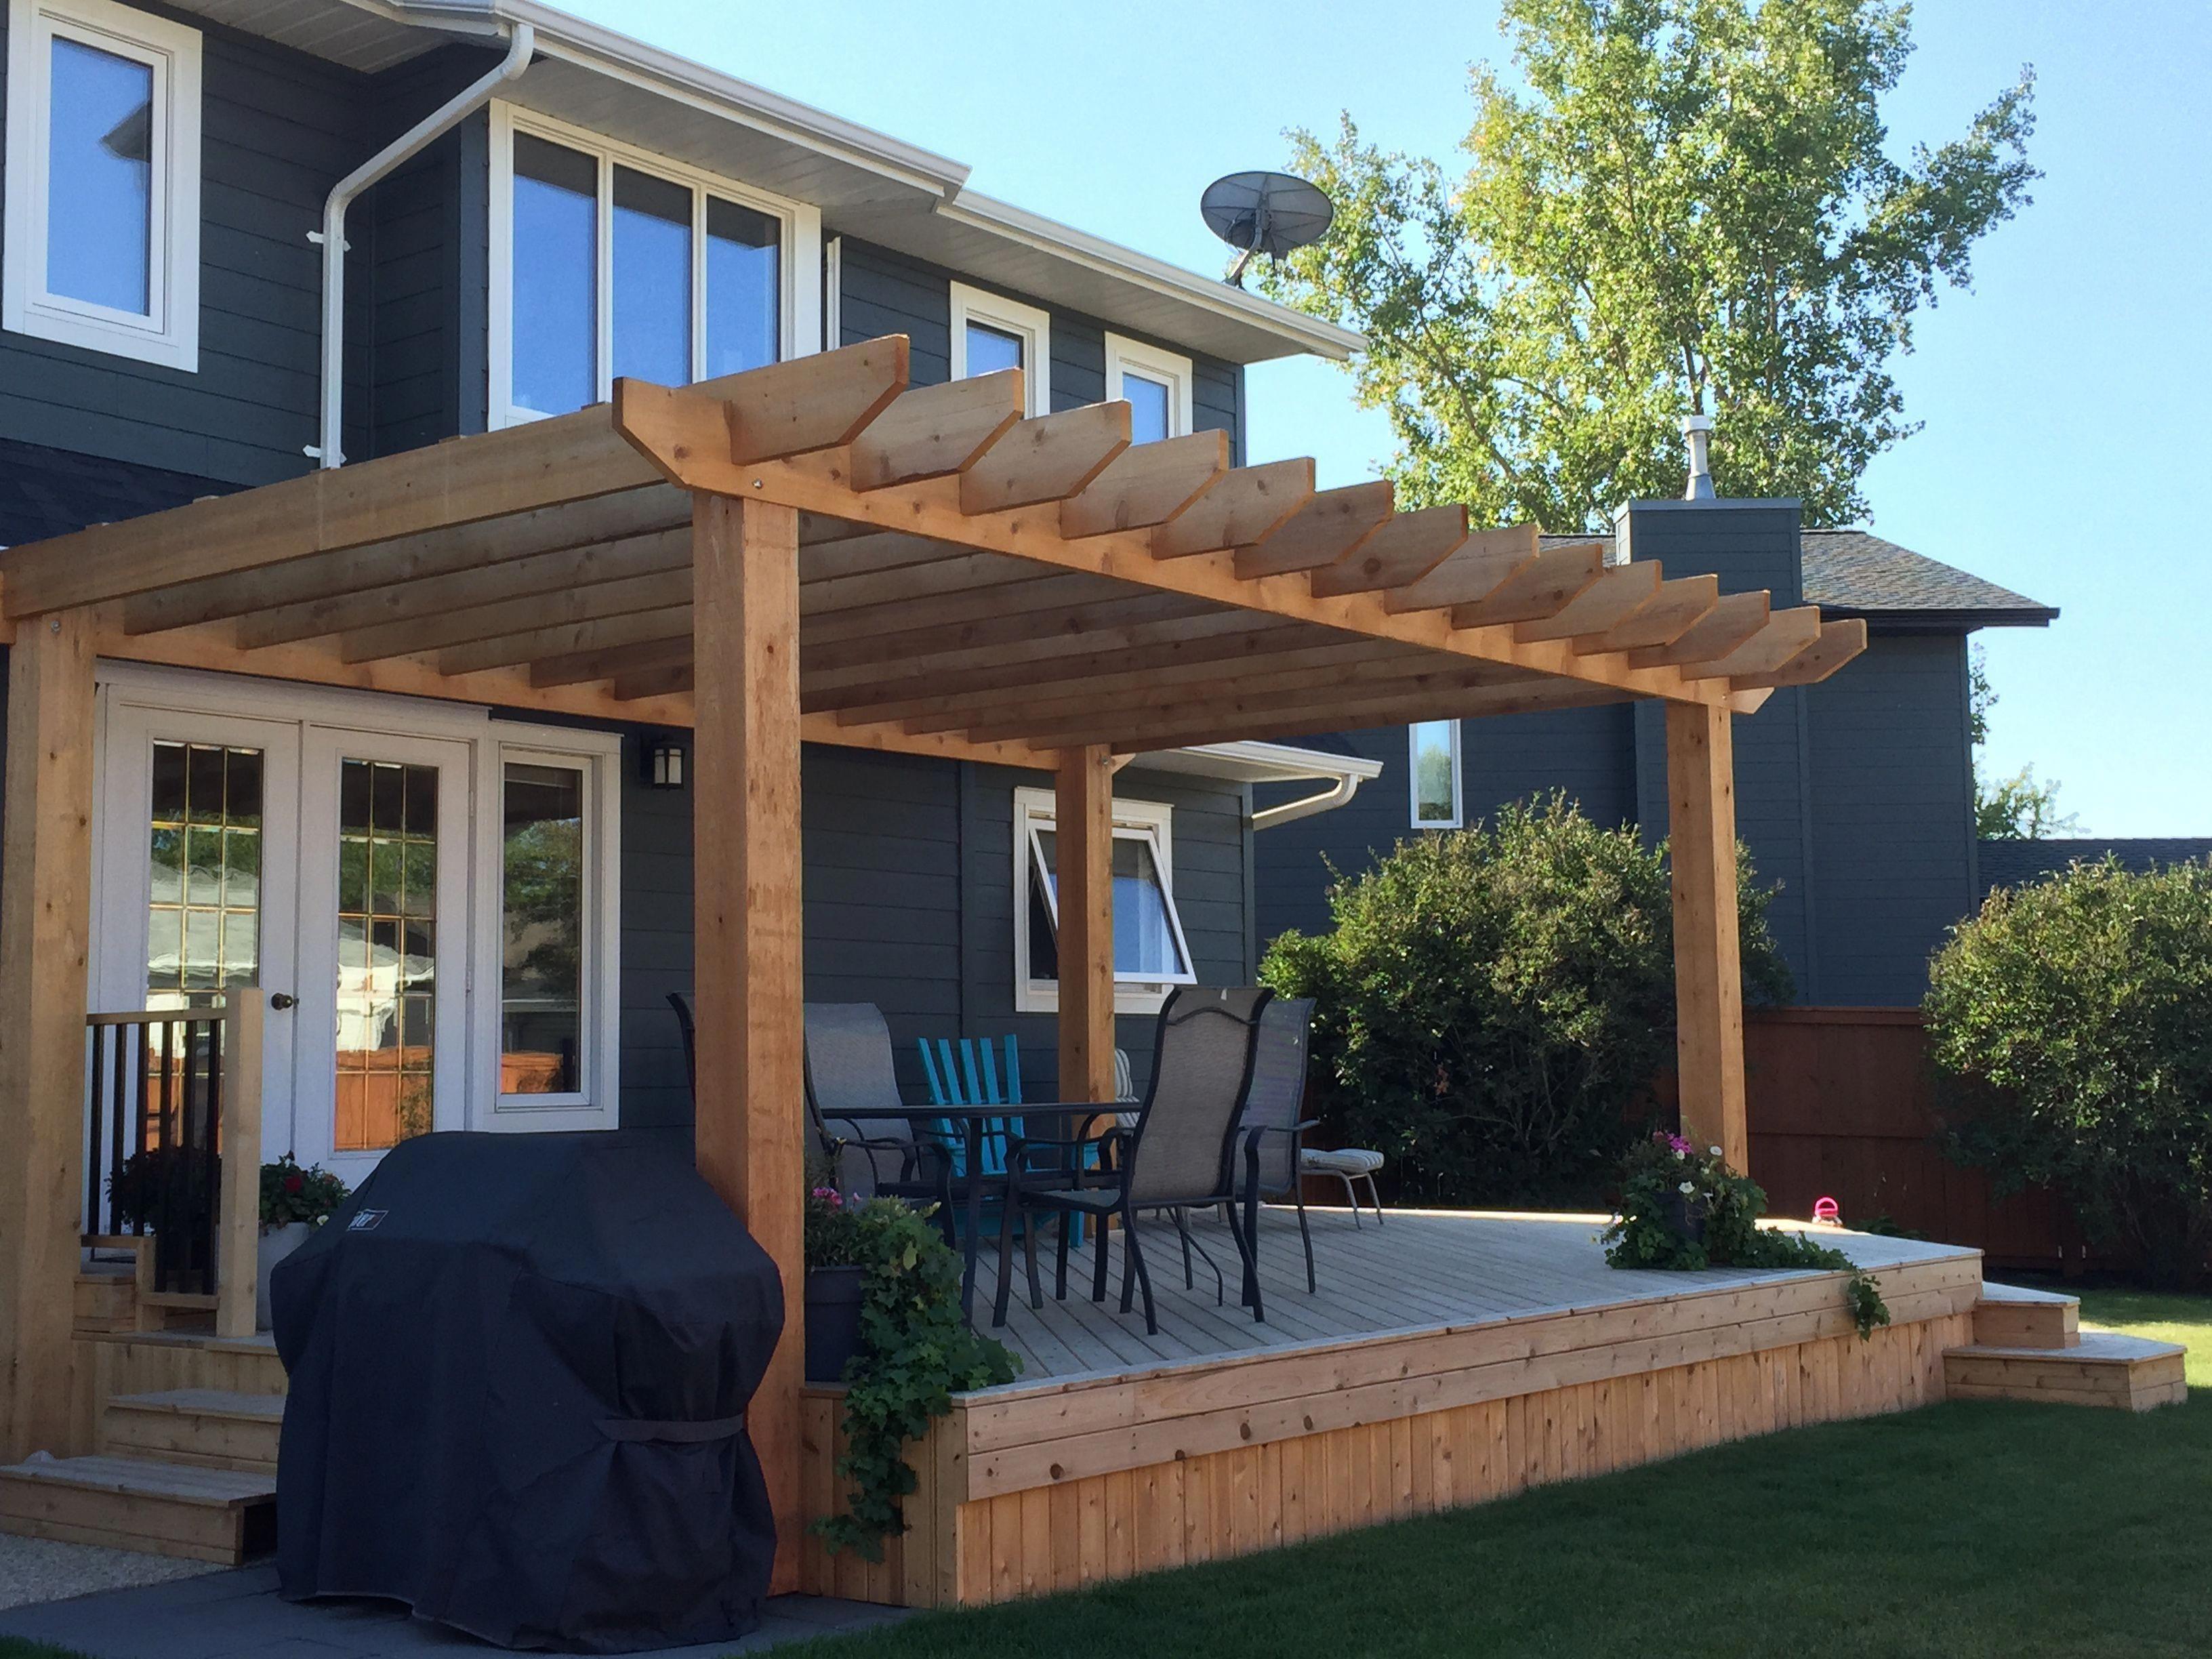 Pergola Builders Near Me #PergolaWithRoof | Backyard patio designs, Backyard pergola